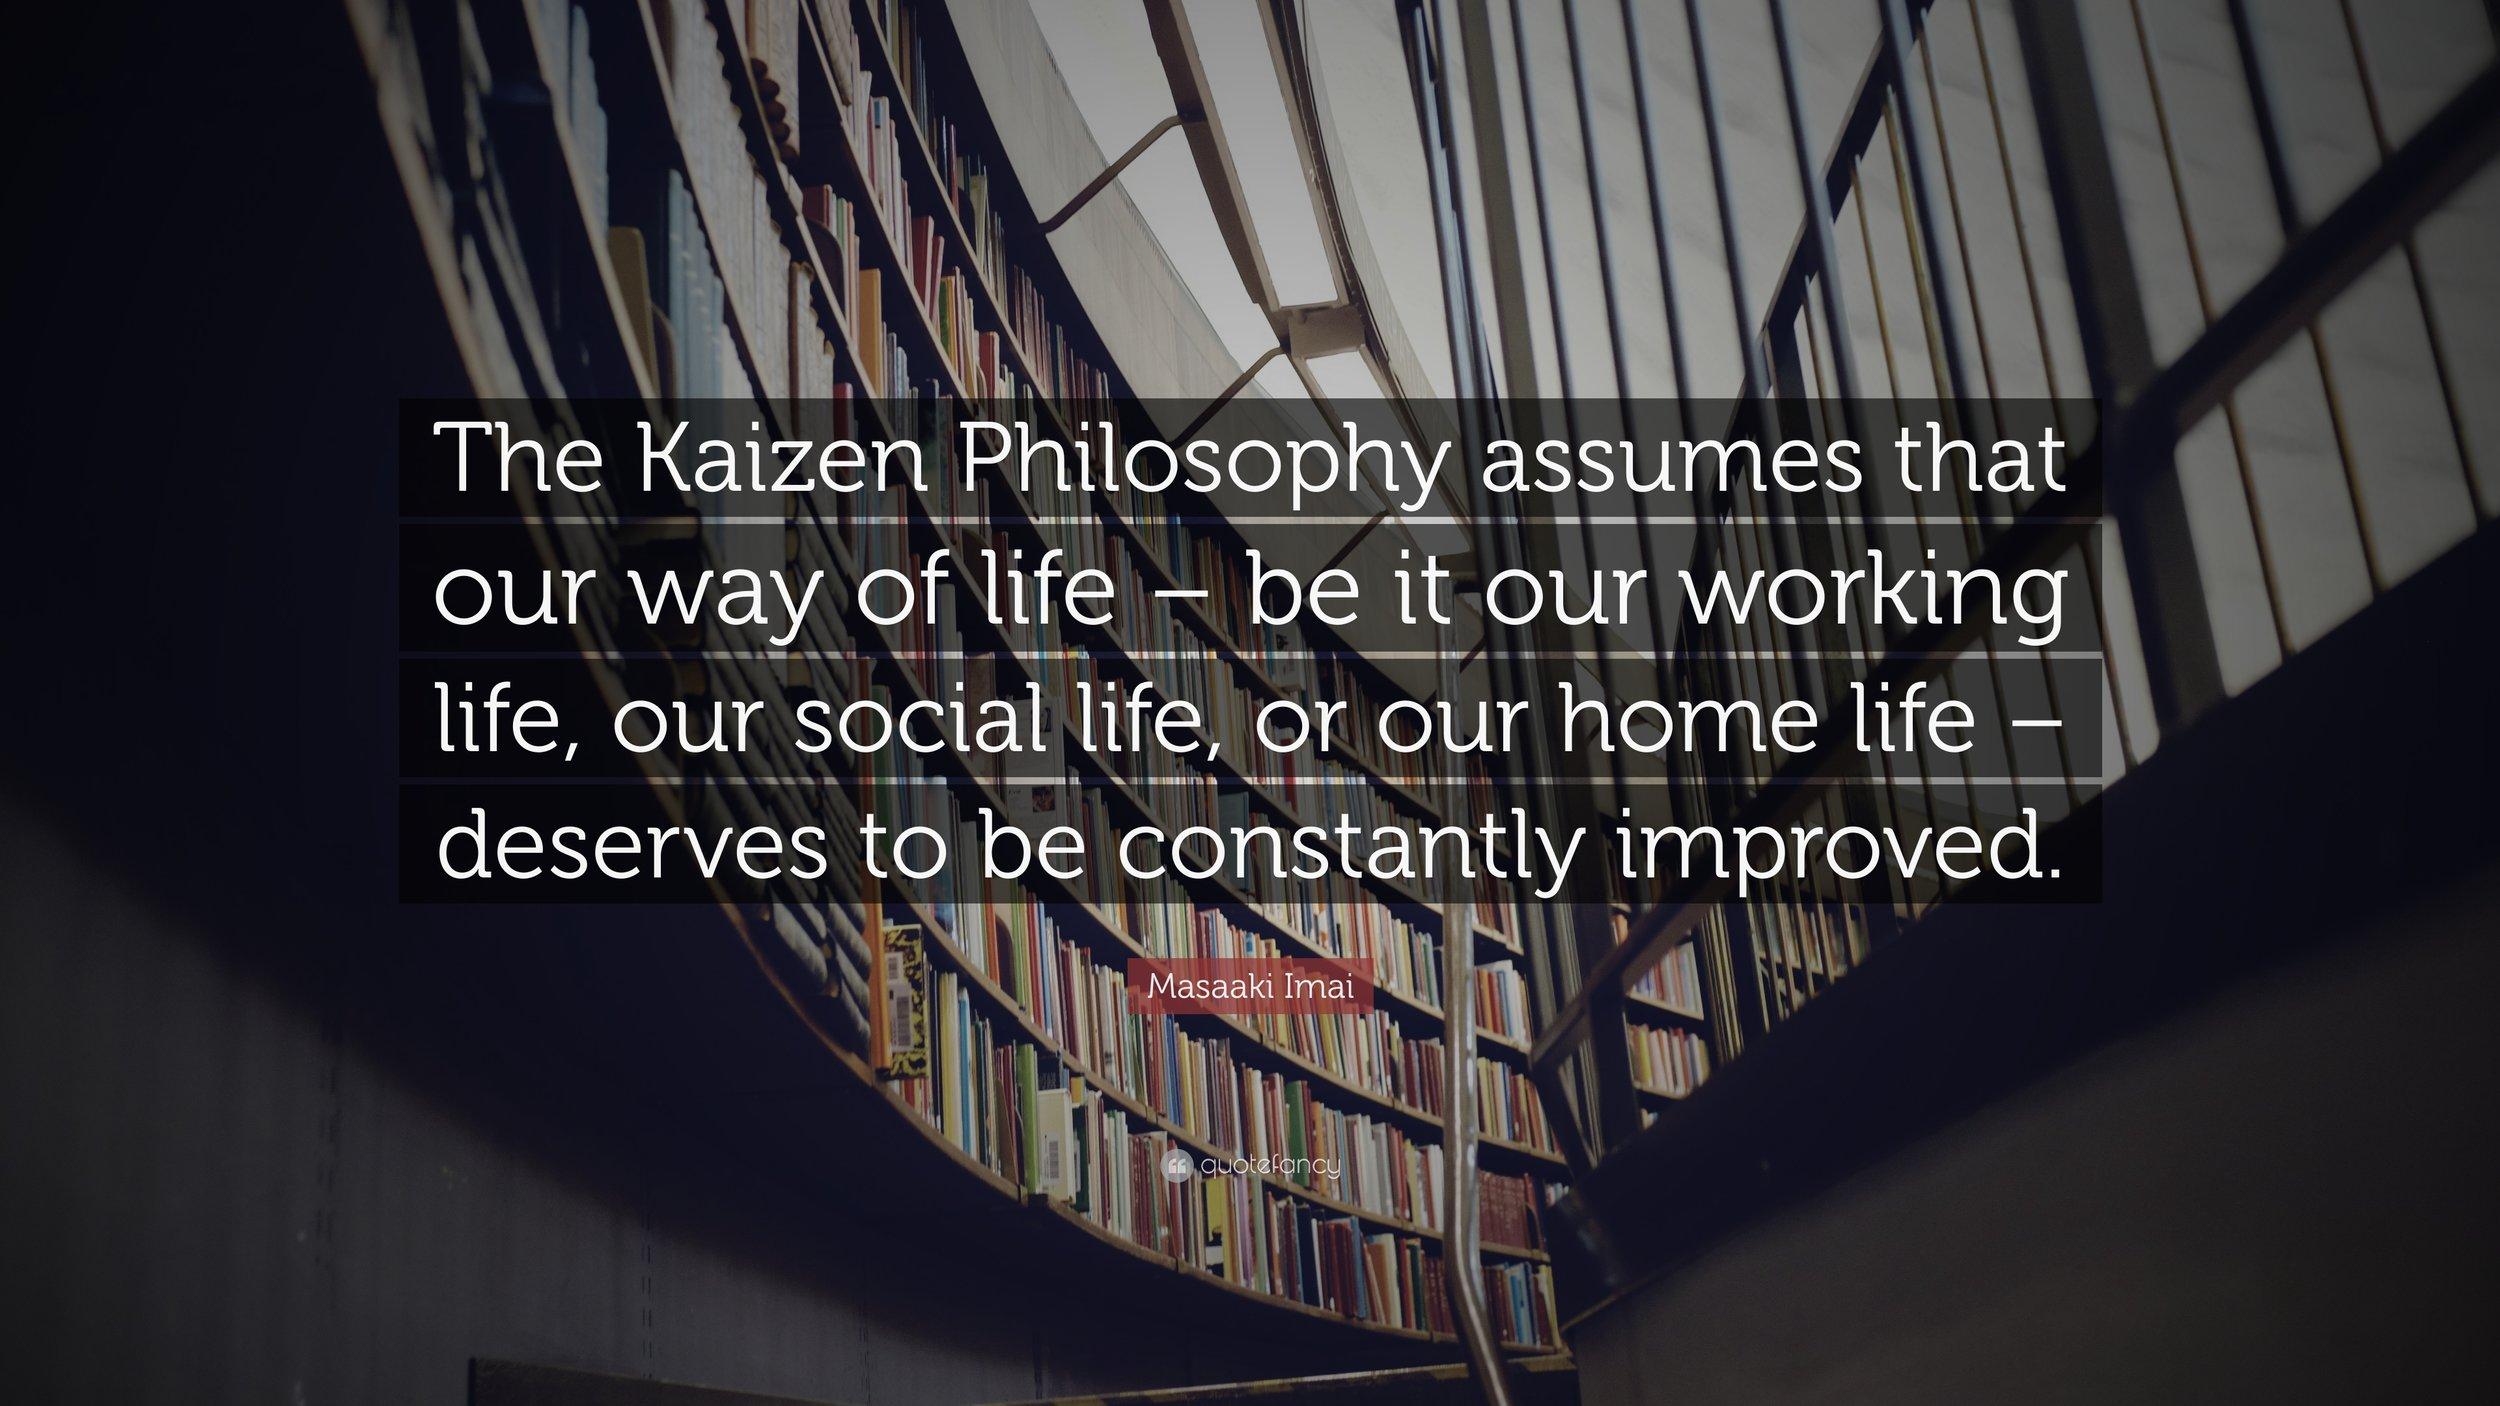 kaizen explanation.jpg